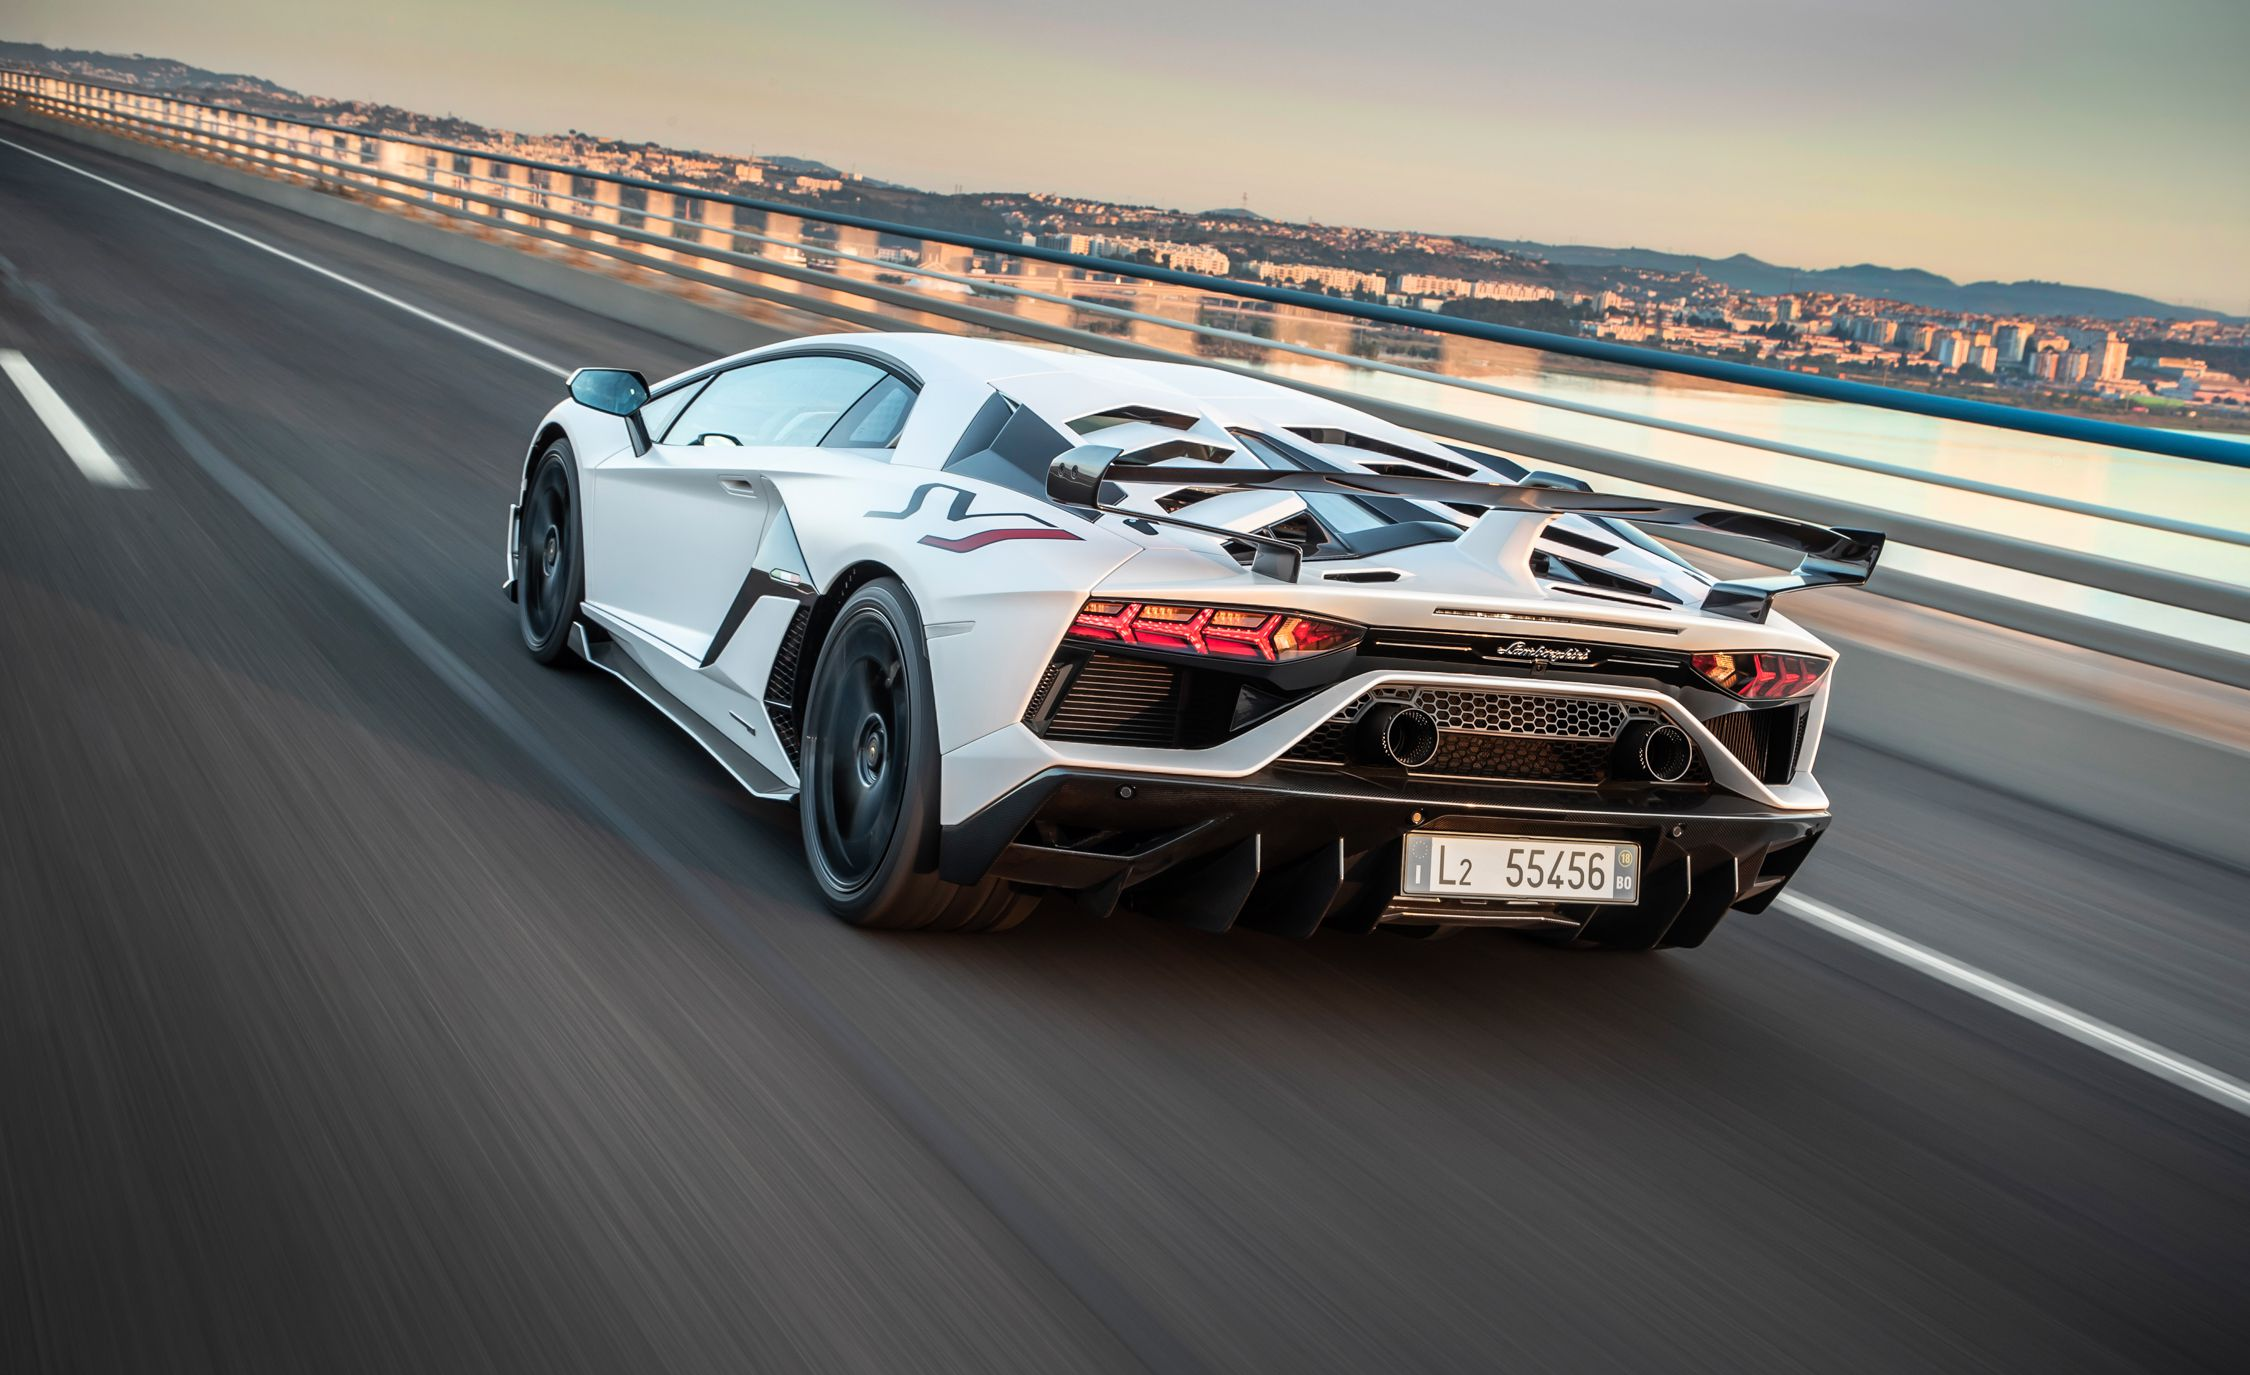 2019 Lamborghini Aventador Svj Rear Three Quarter Wallpaper 128